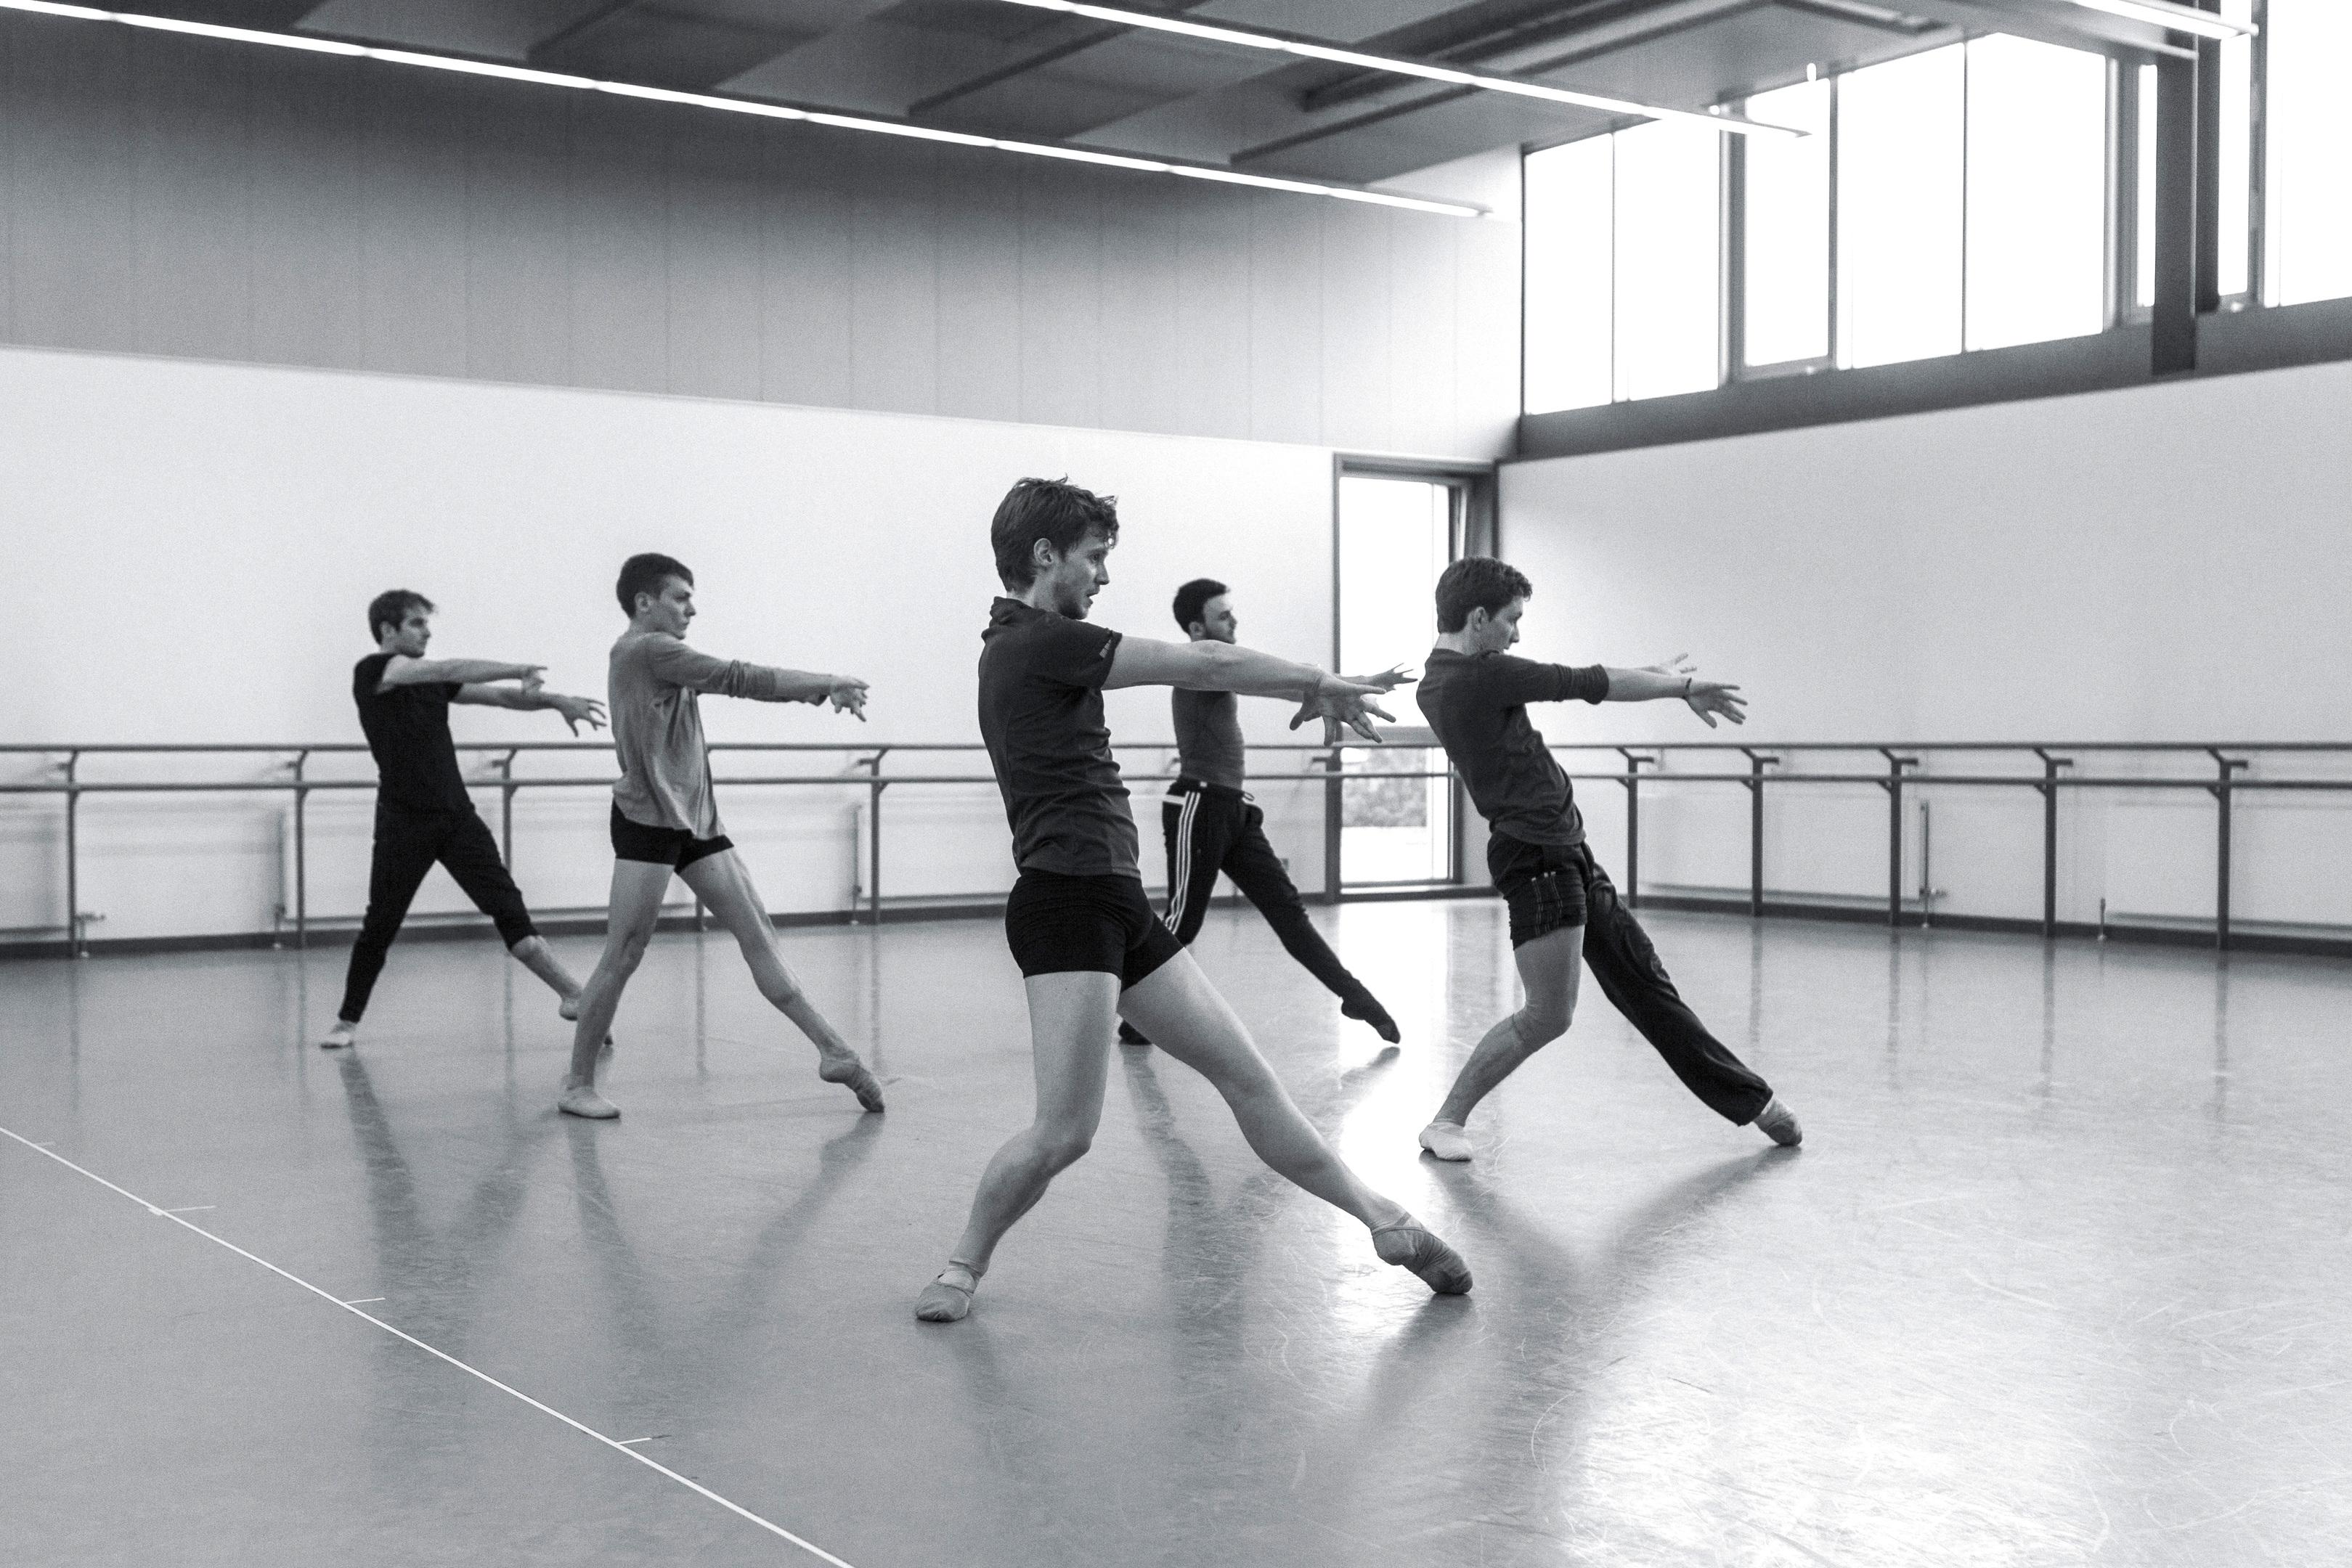 _MG_7194 – Victor Zarallo, Jamiel Laurence, Andrew Peasgood, Nicholas Shoesmith and Rimbaud Patron in rehearsals for David Dawson's Swan